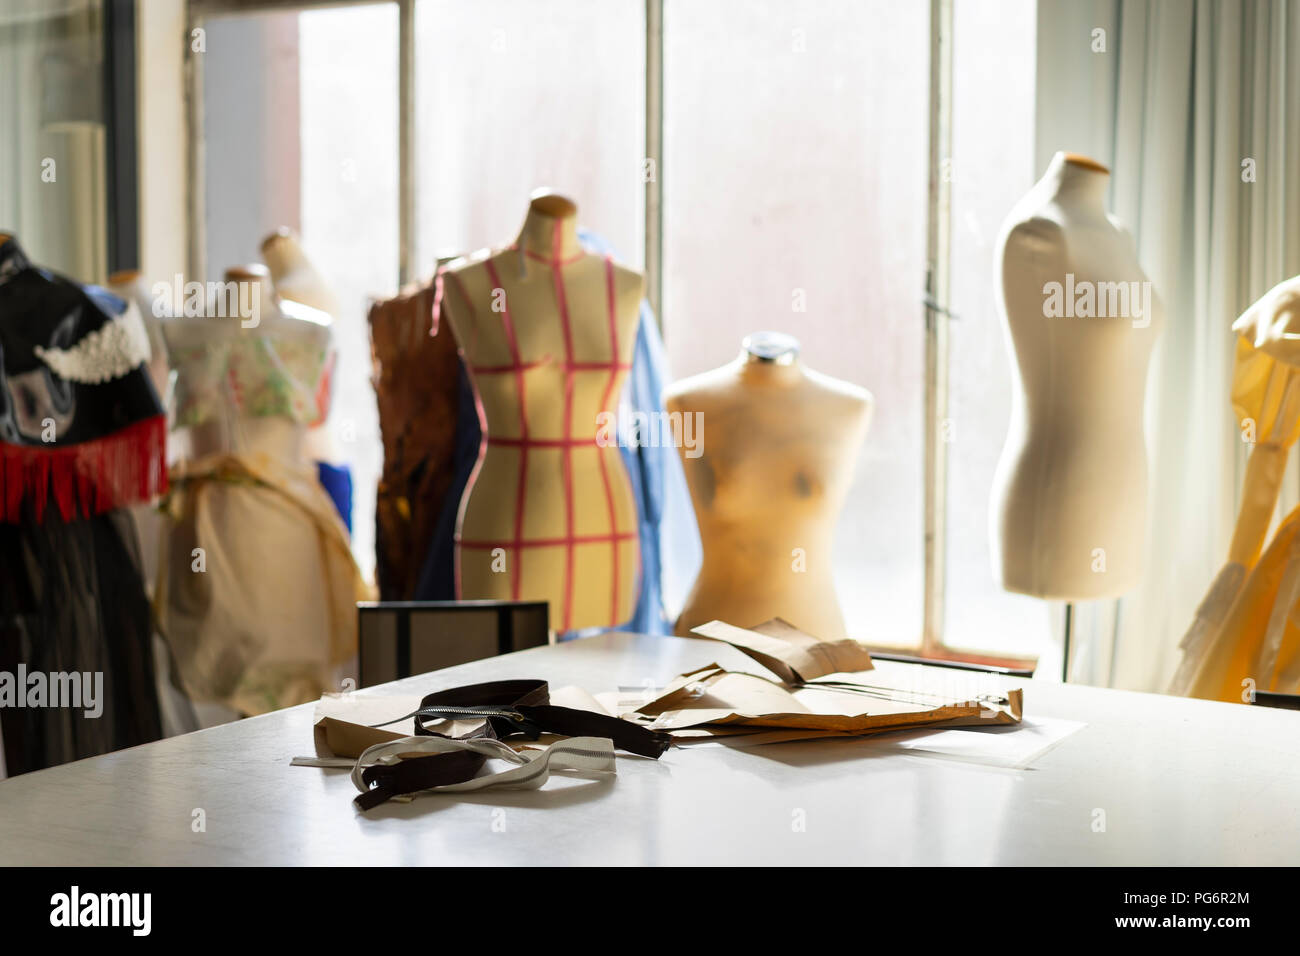 Dressmaker's models in fashion designer's studio - Stock Image